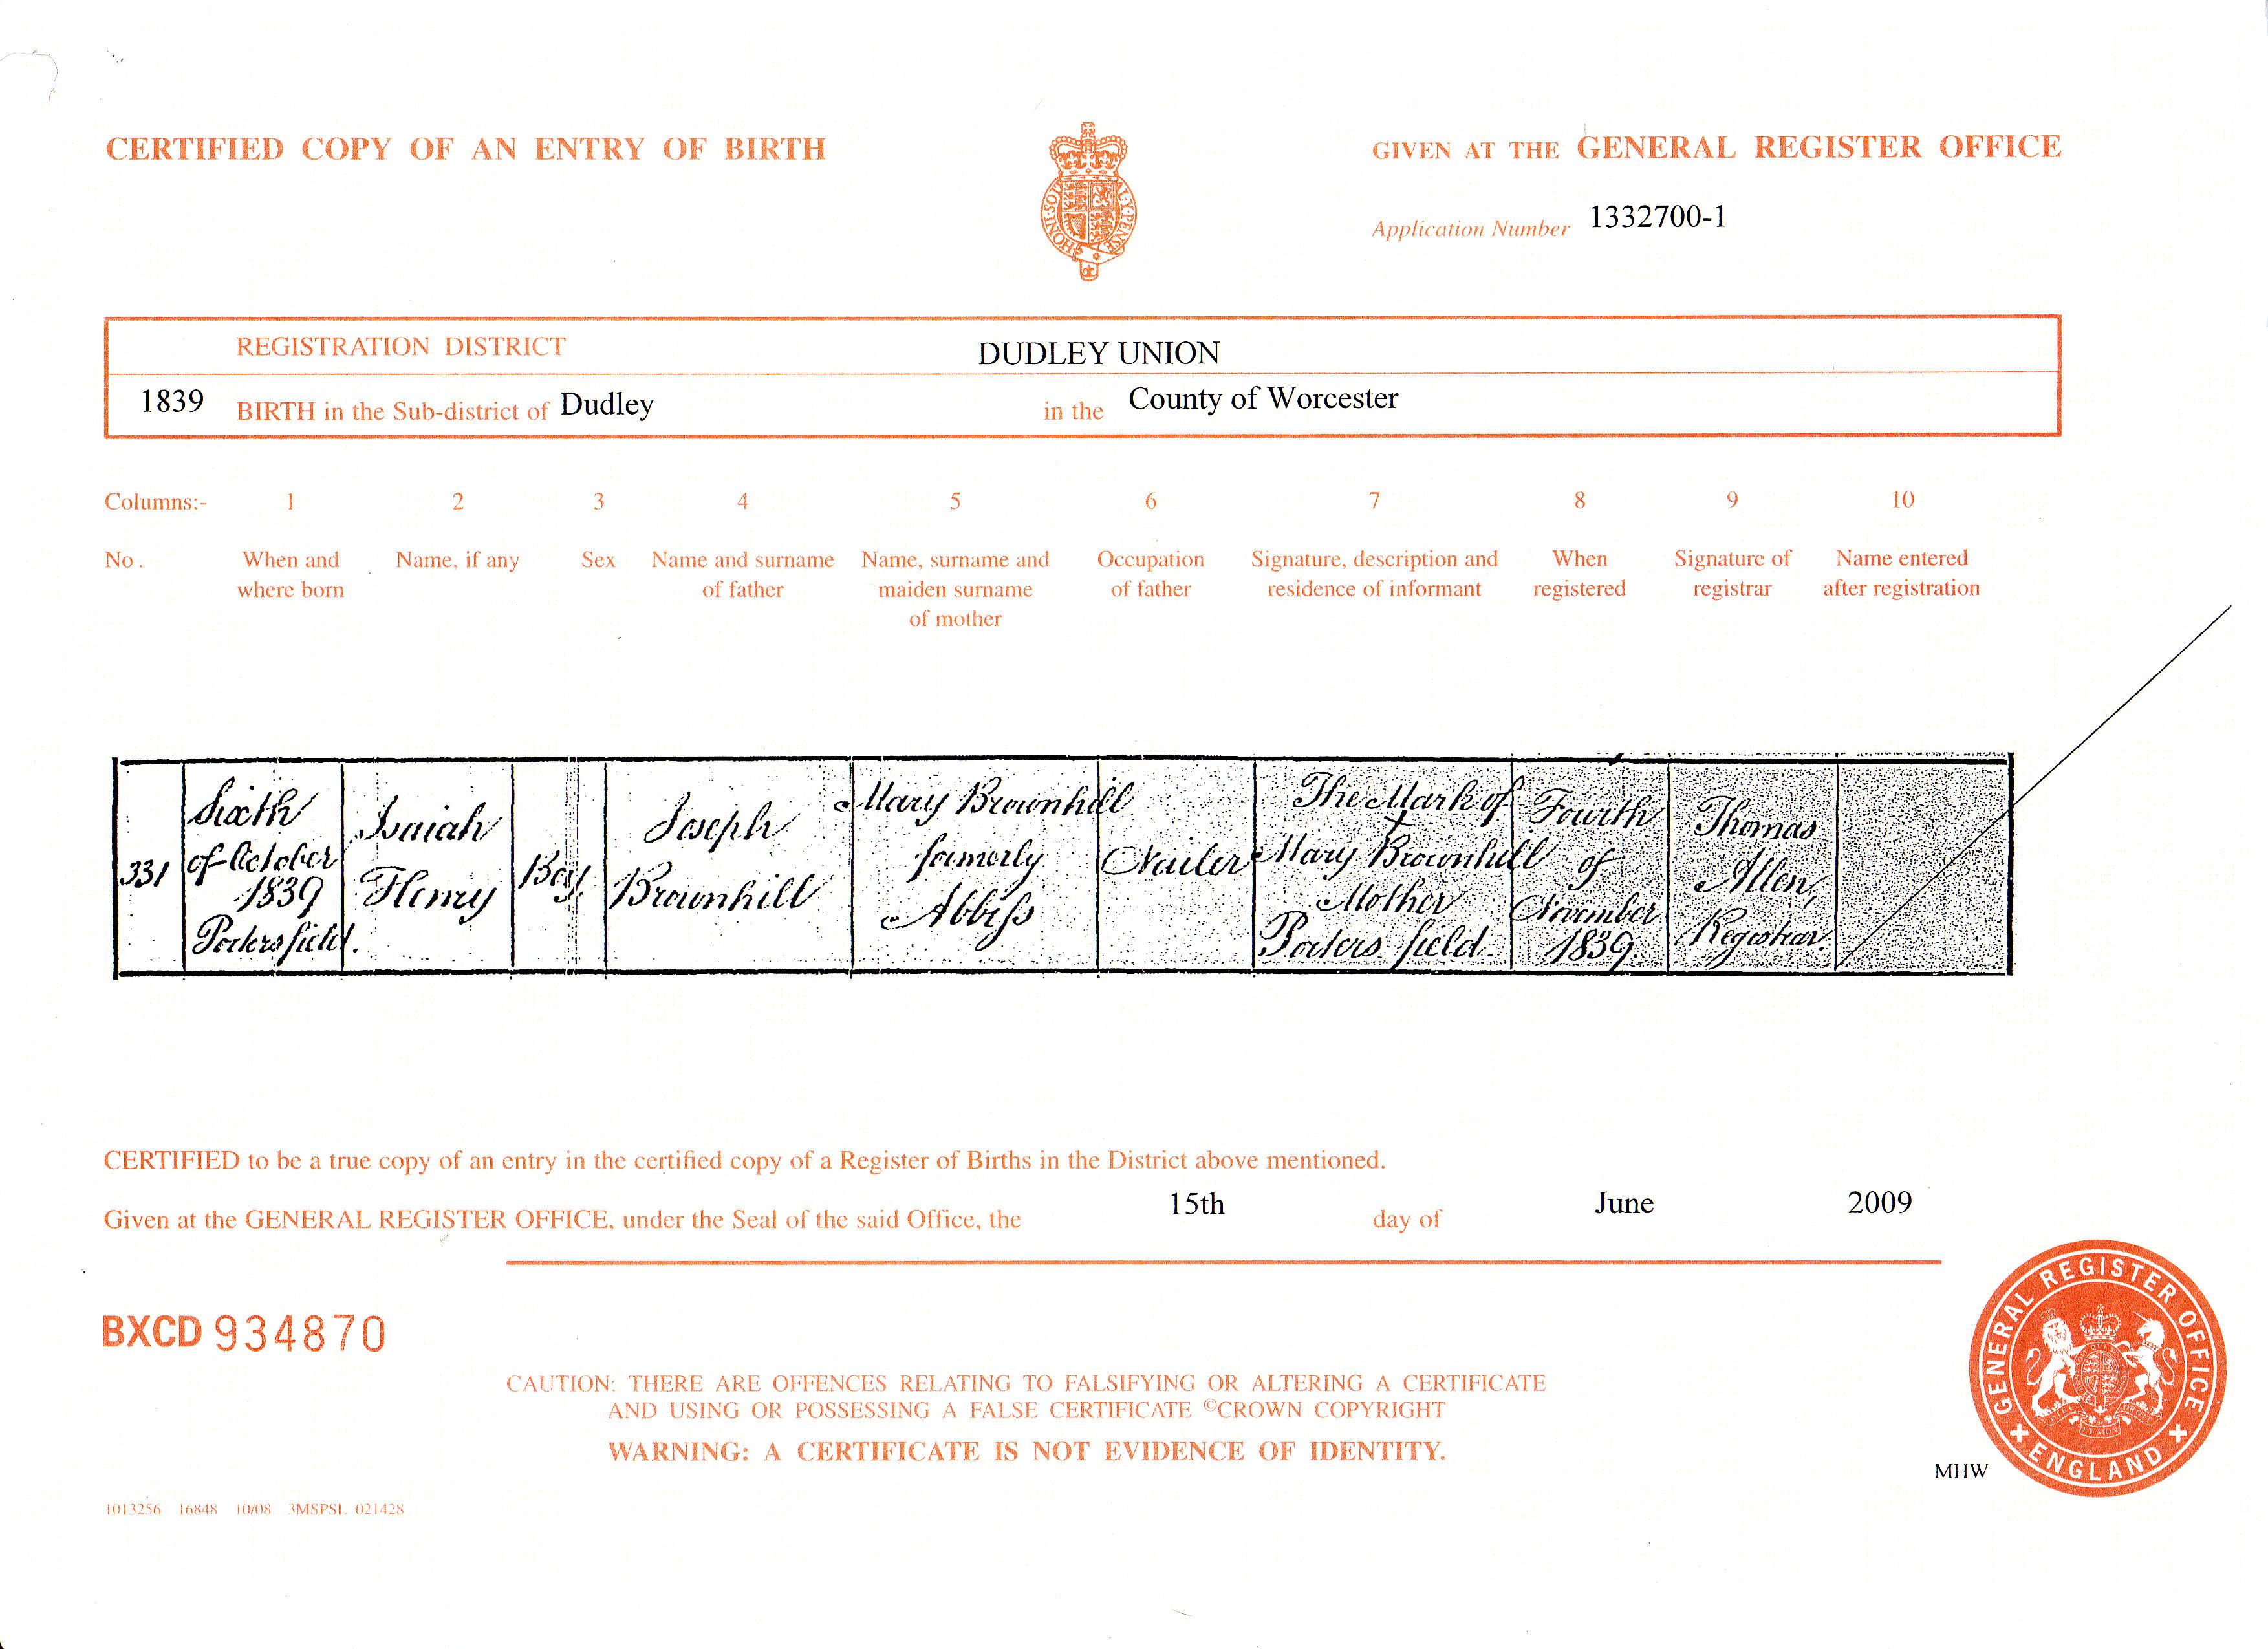 Isaiah henry brownhills birth certificate original digital image 3507 x 2550 pixels xflitez Choice Image